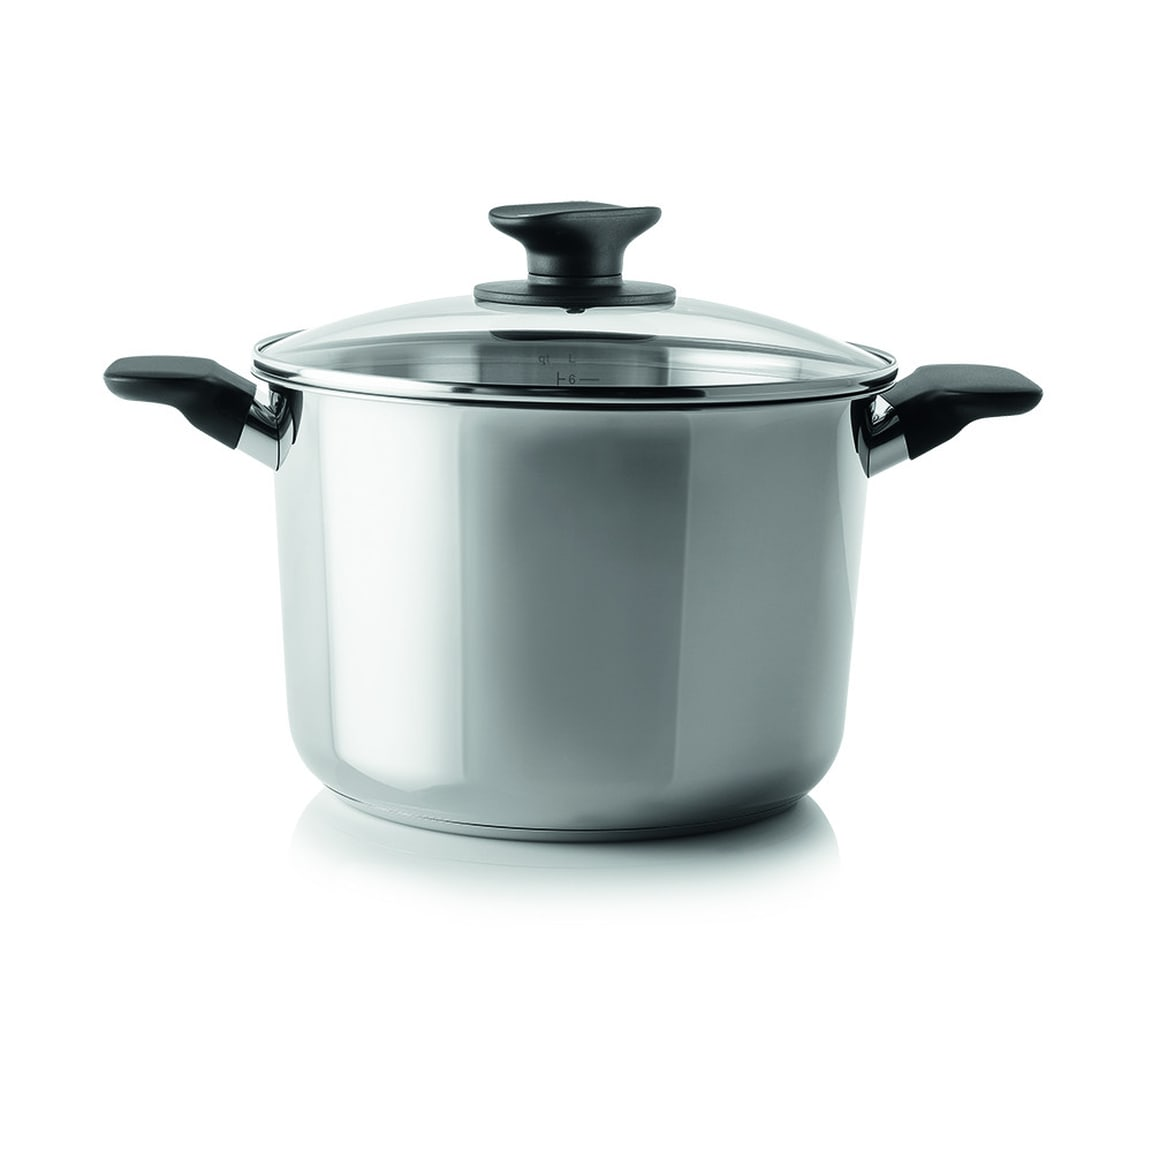 Universal Cookware Stockpot 7.0L